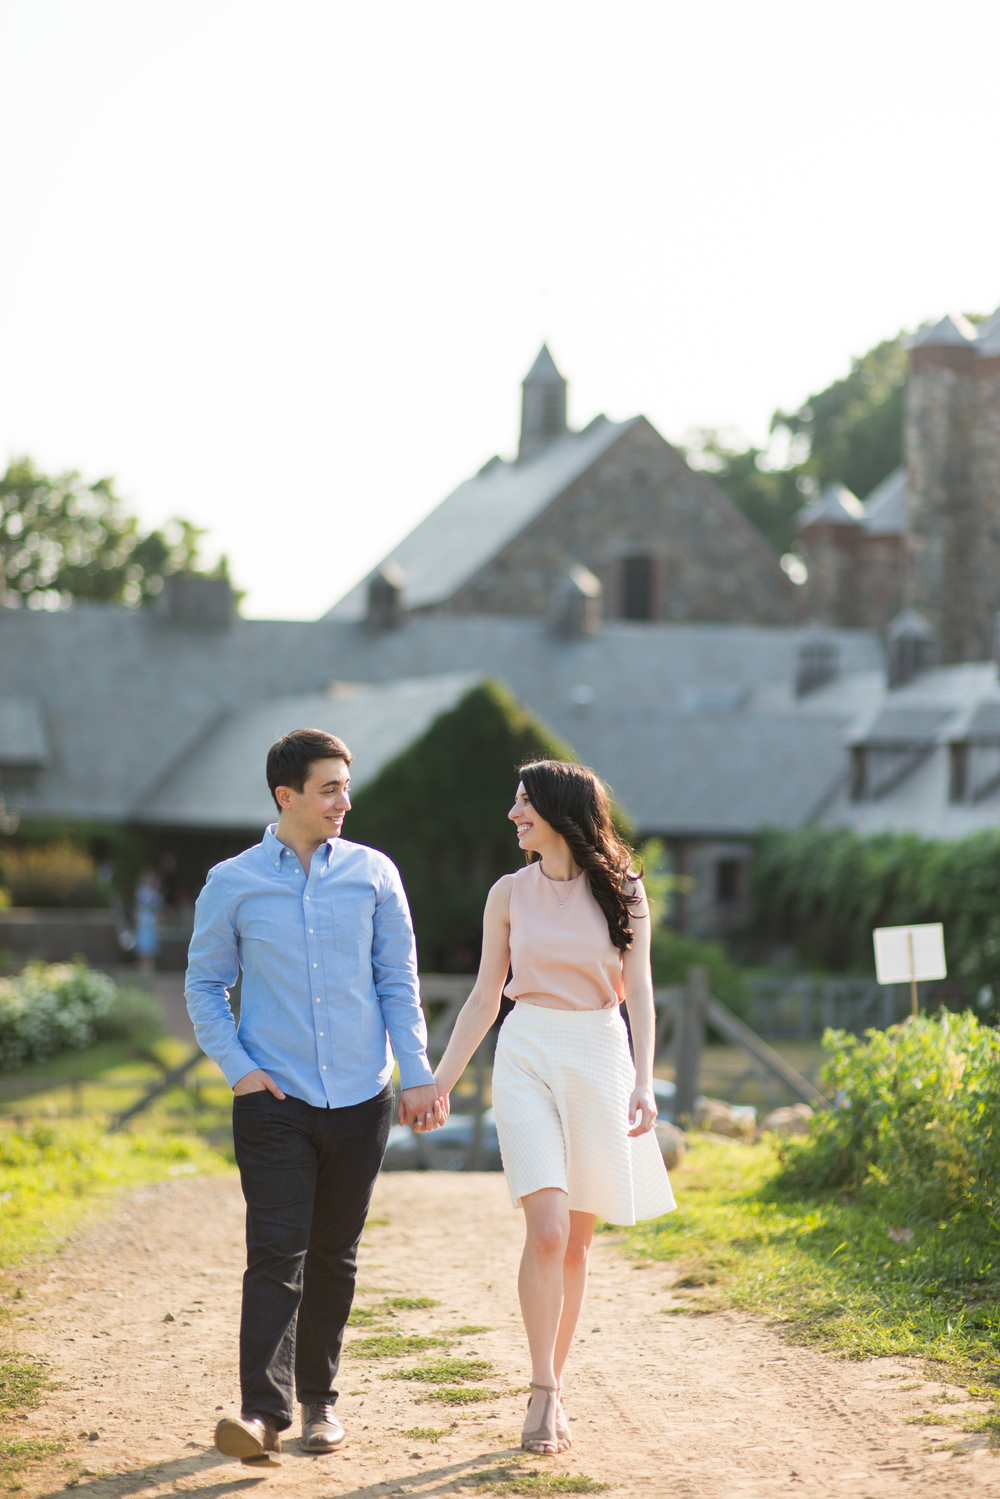 Emily&Aaron_Engagement175.JPG